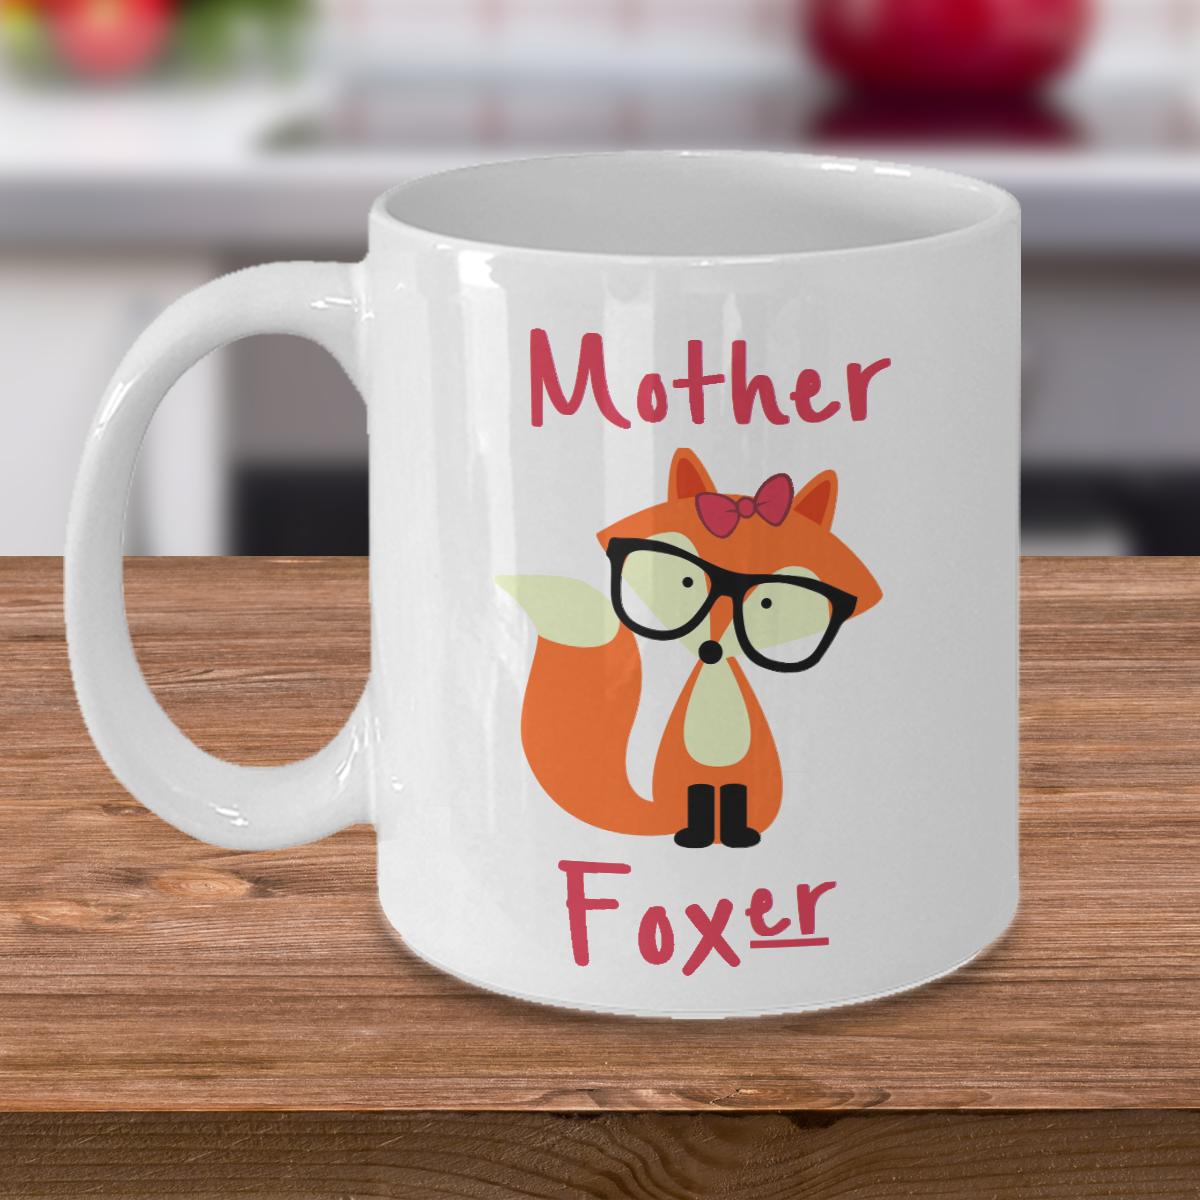 Mother Foxer - Curse Mug - Coffee Cup Mug - Tea Mug - Ceramic Mug Gift - Coffee Lover - Gift for Crafty Friend